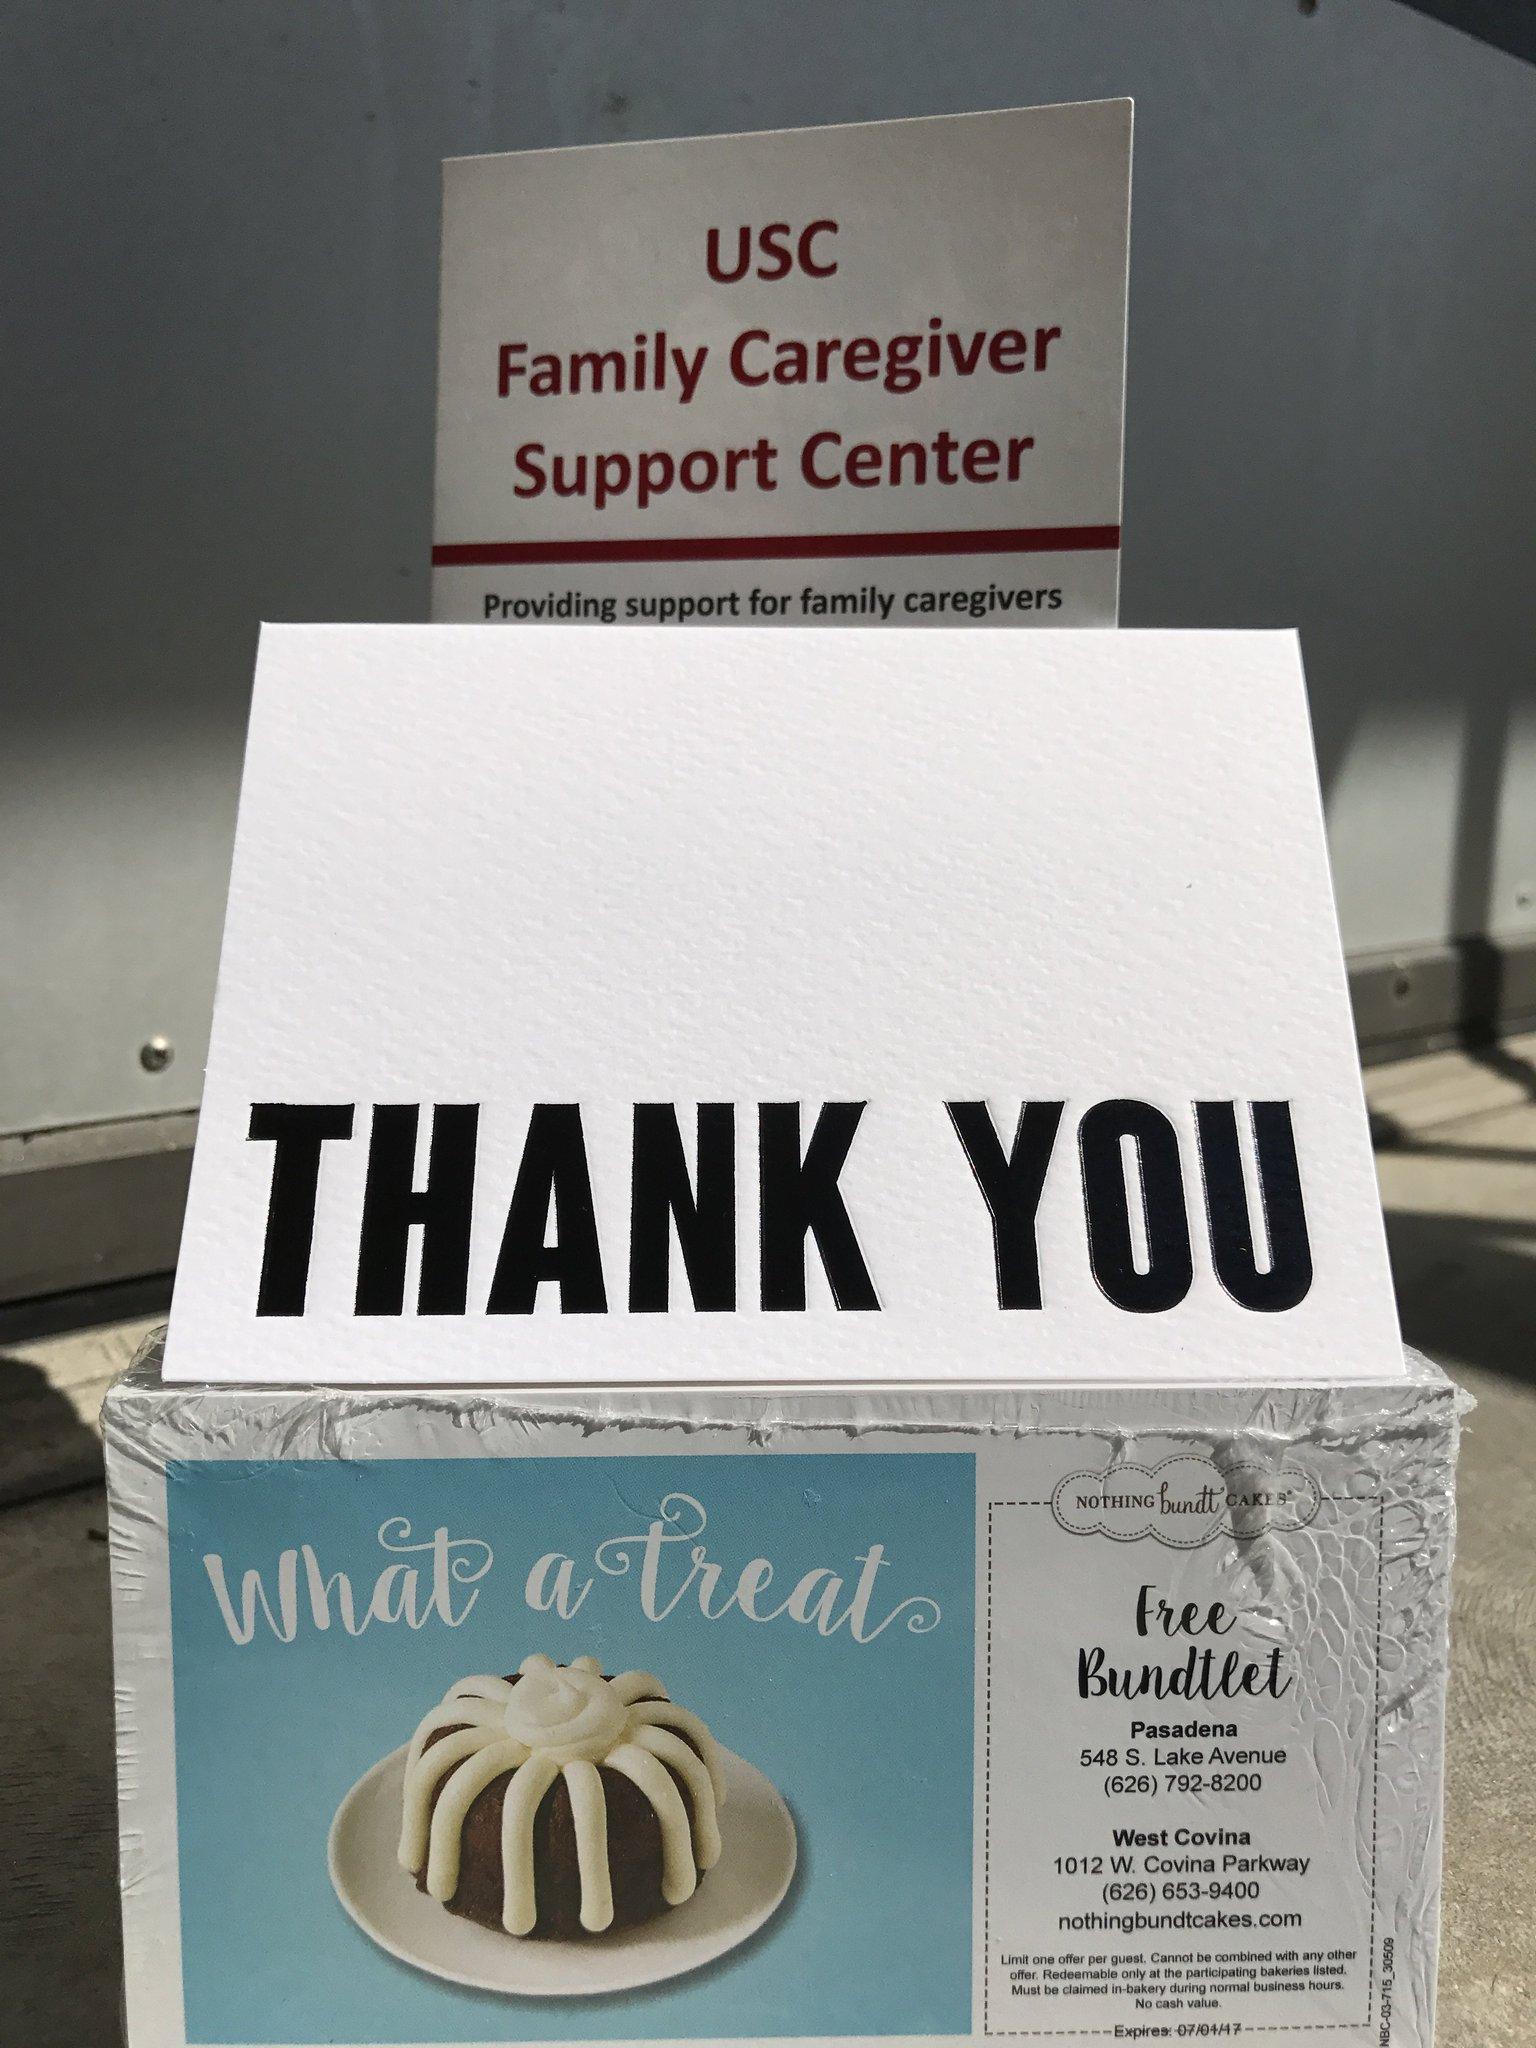 @nothingbundt will be sweetening hundreds of #caregivers lives. USC Encore Trojans #SCervice https://t.co/16Cfdbnusi